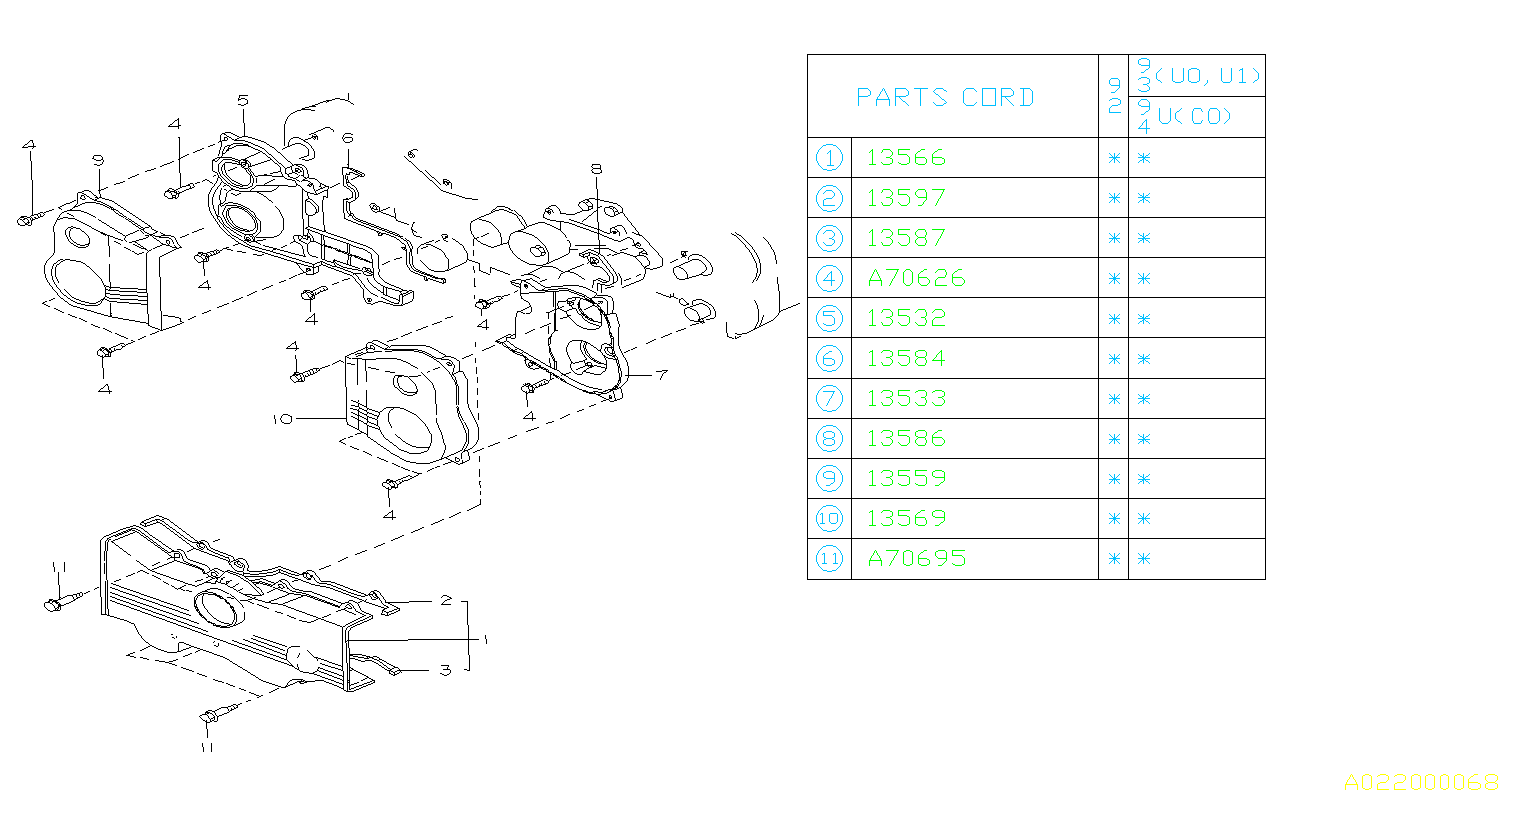 1992 Subaru Svx Engine Timing Cover Gasket